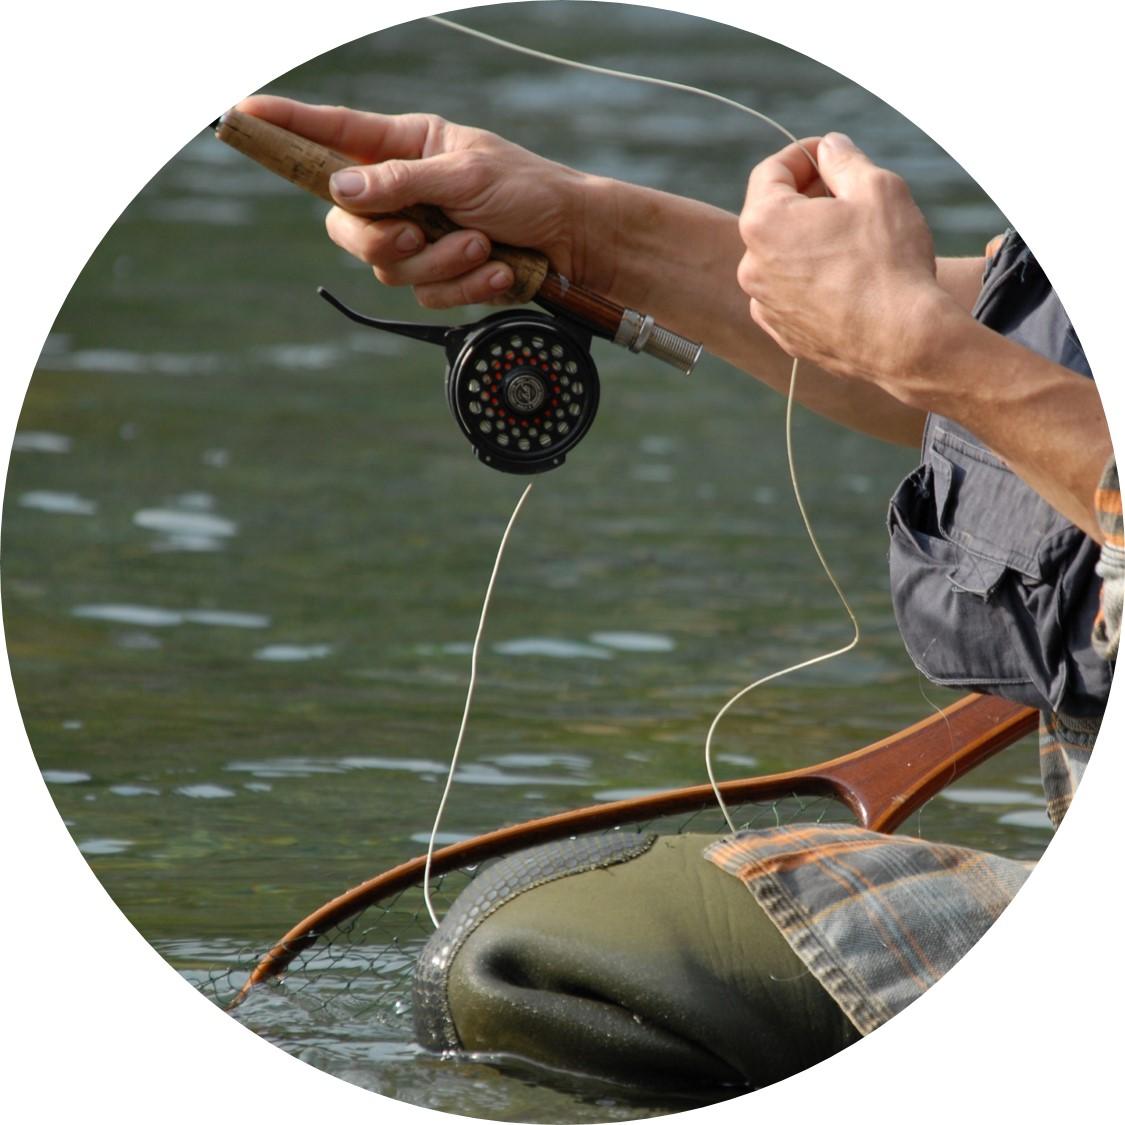 Hilo de pesca flexible nylon